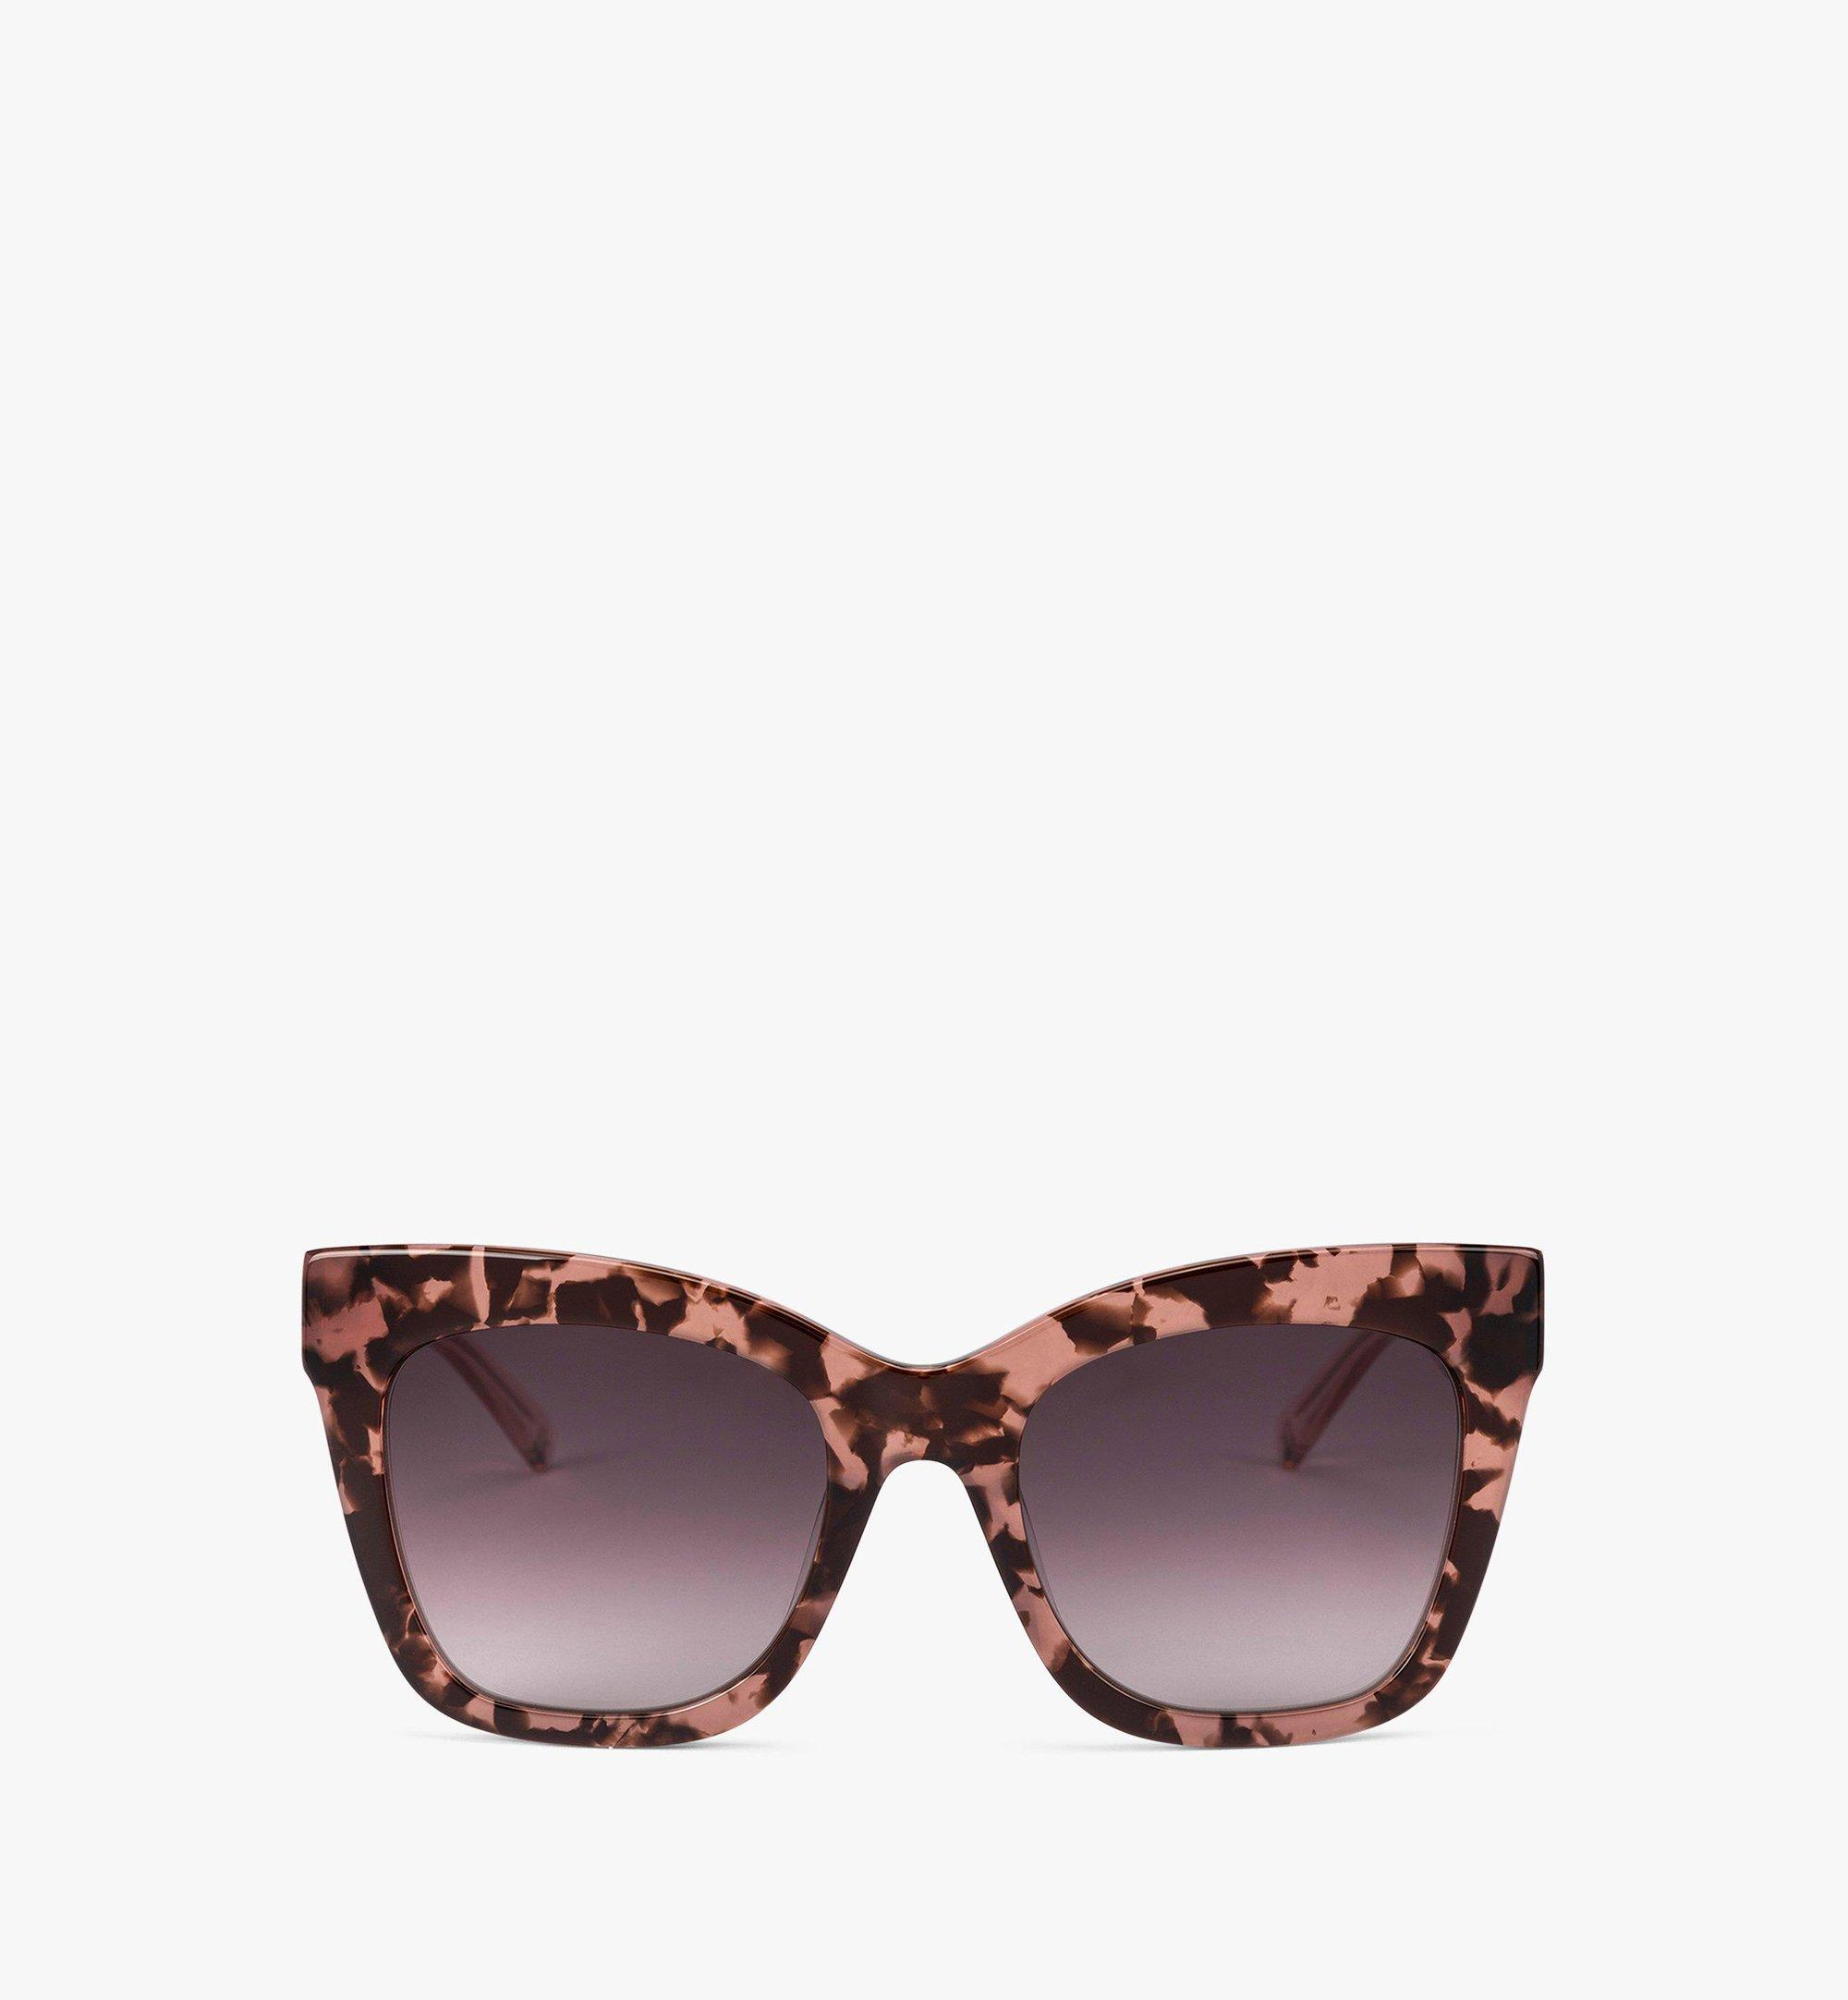 MCM MCM686SE Rectangular Sunglasses Pink MEGBAMM13PR001 Alternate View 1